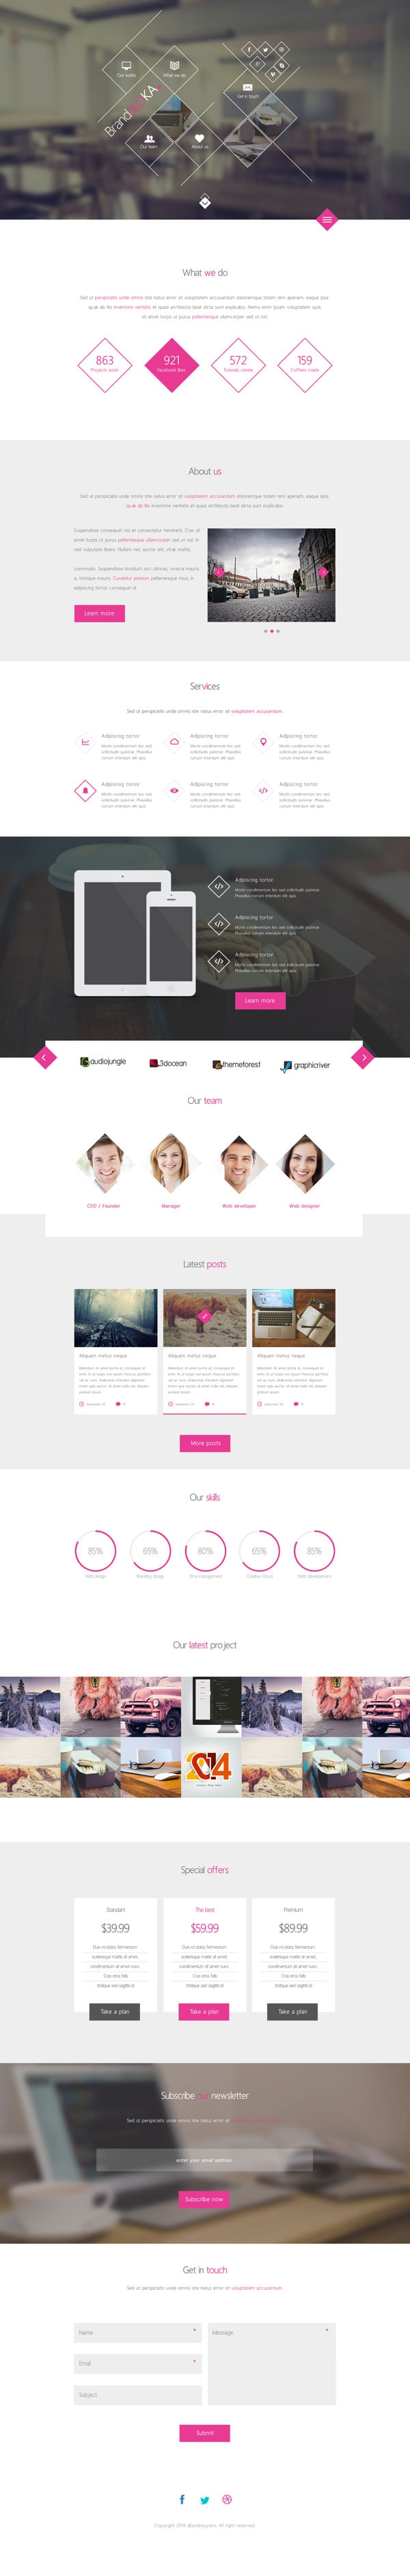 BrandaLoka-–-Creative-Onepage-PSD-Template